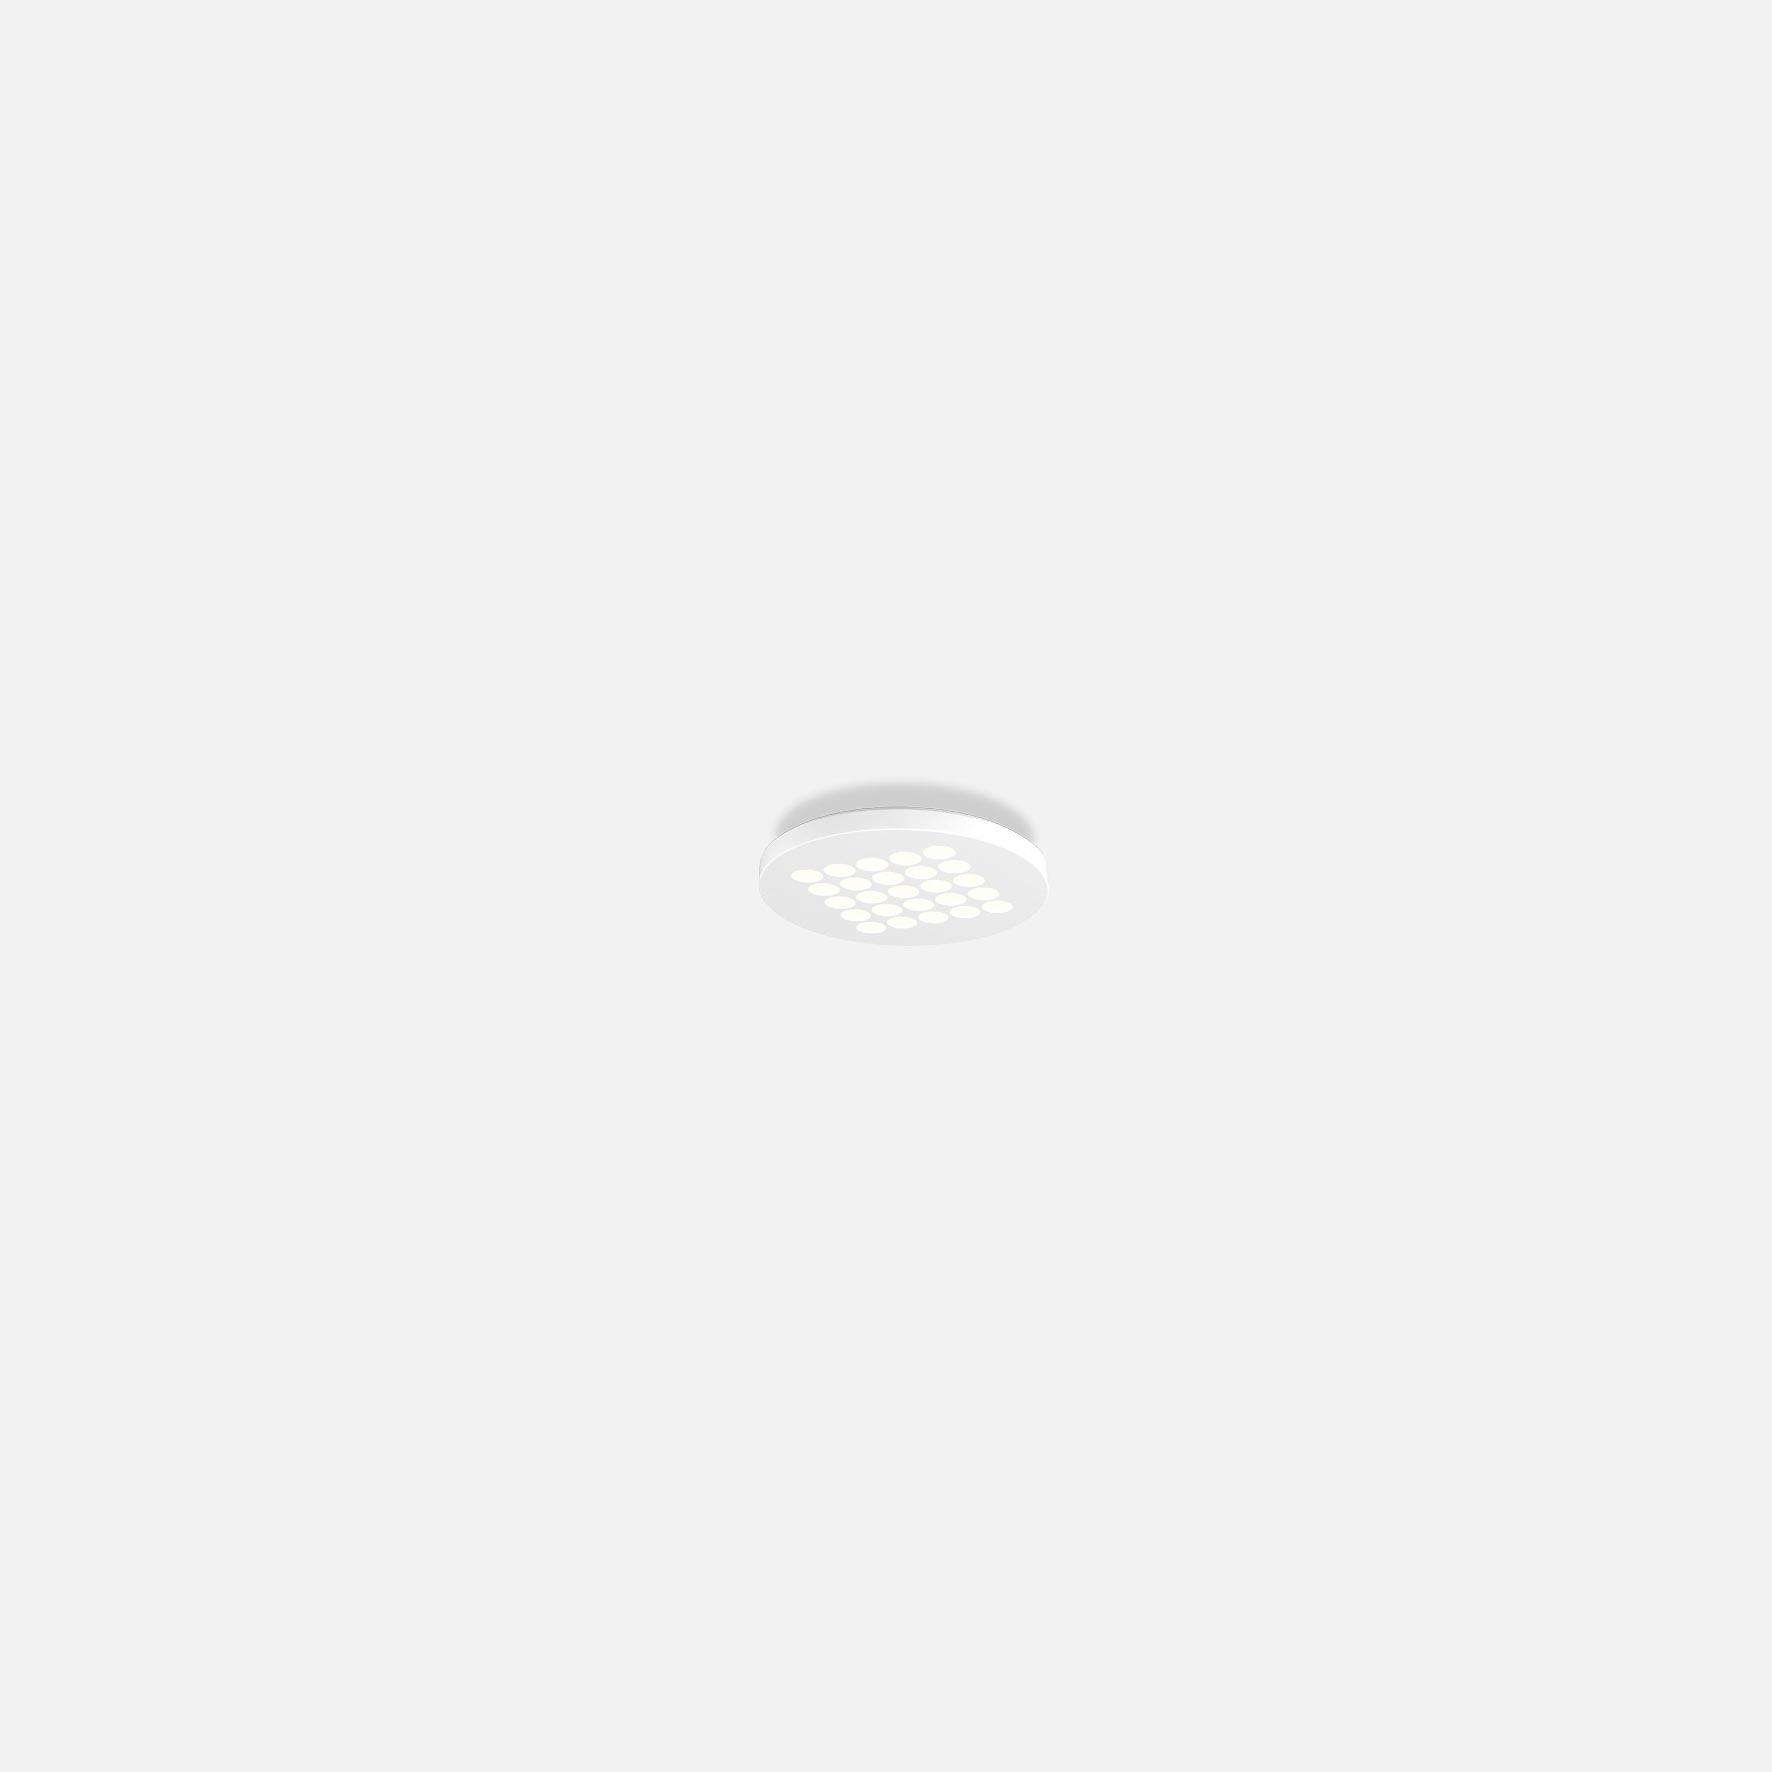 Cory 1.3 white texture 01